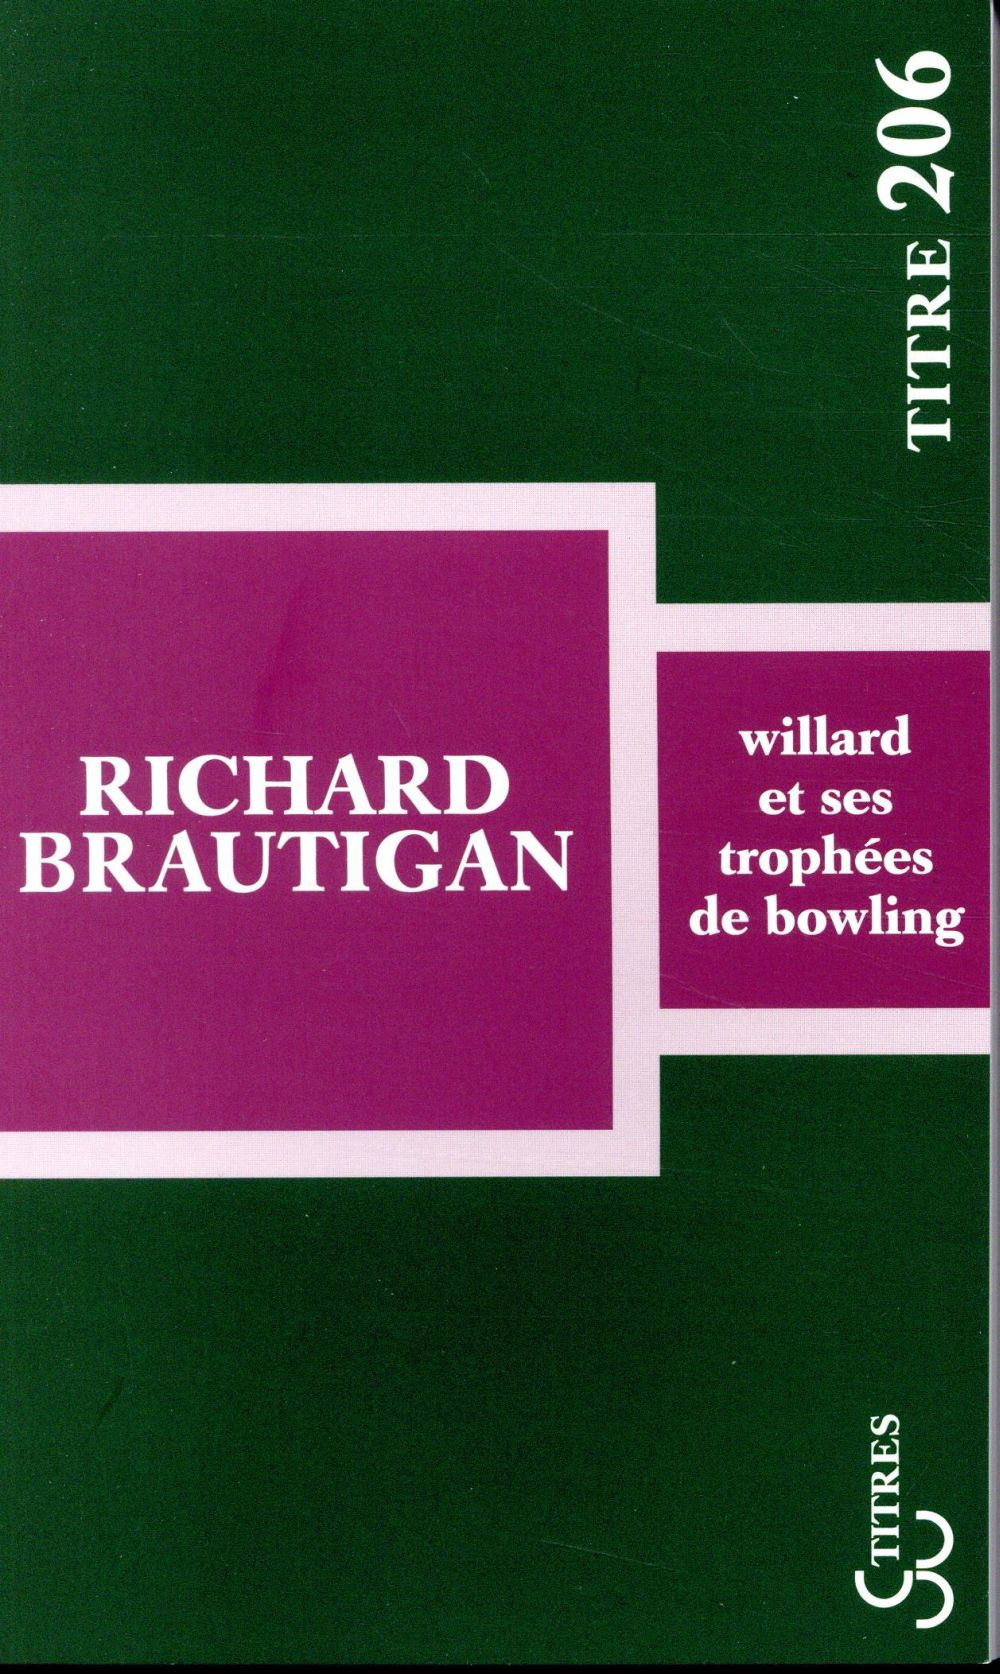 Willard et ses trophees de bowling